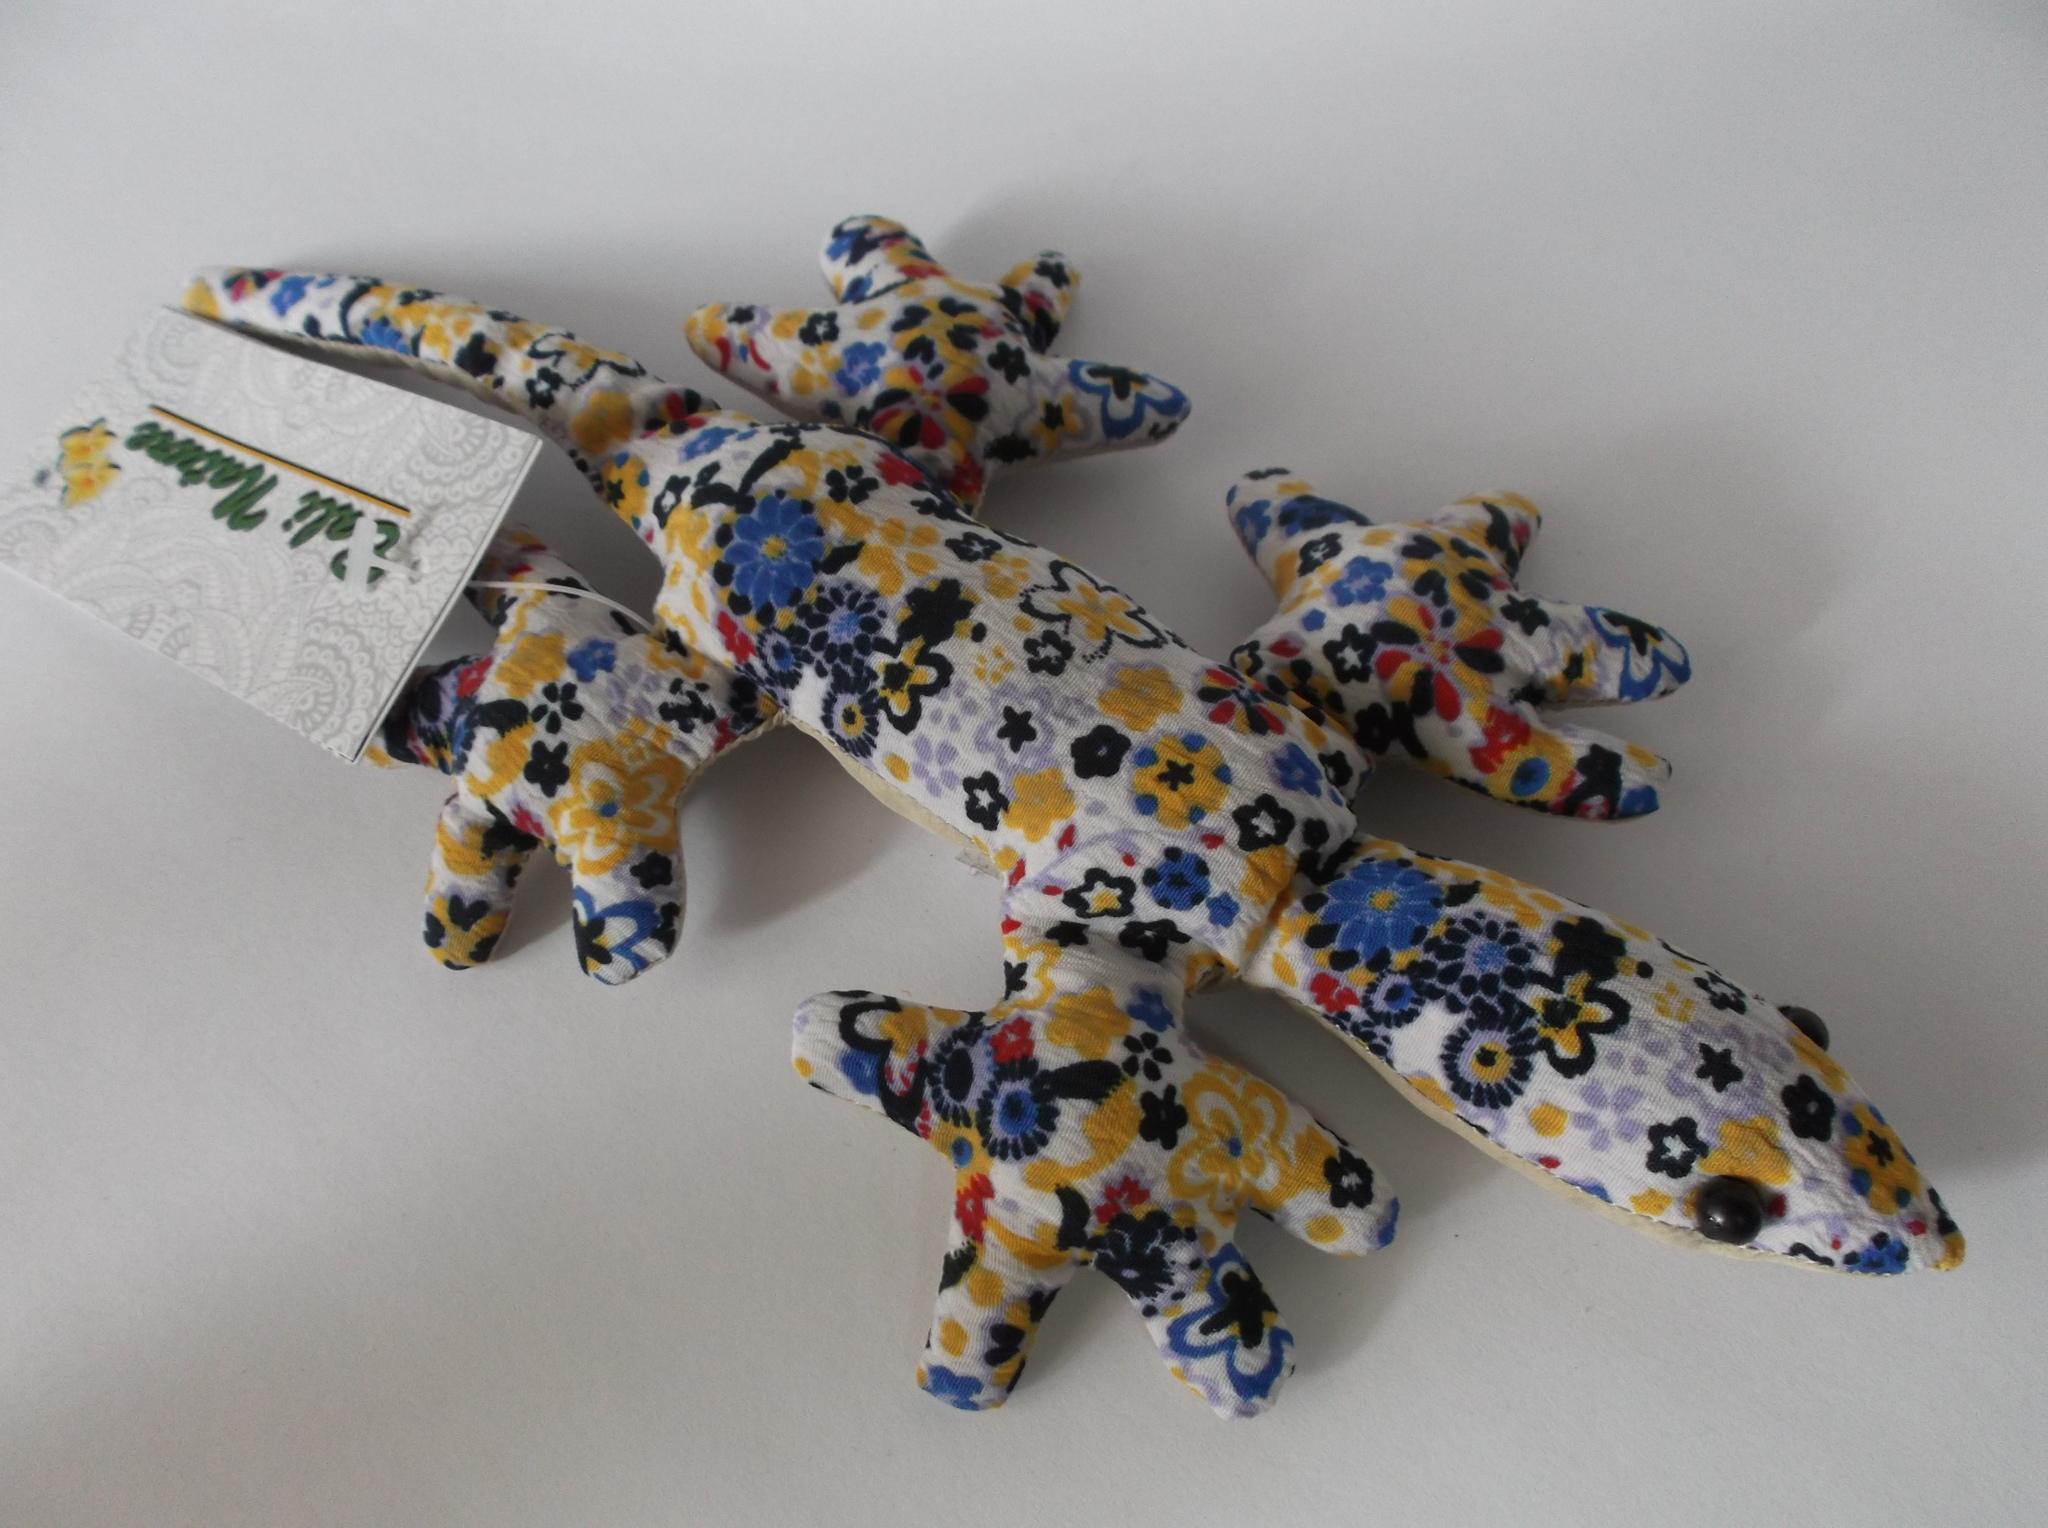 harga sand doll lizard Tokopedia.com